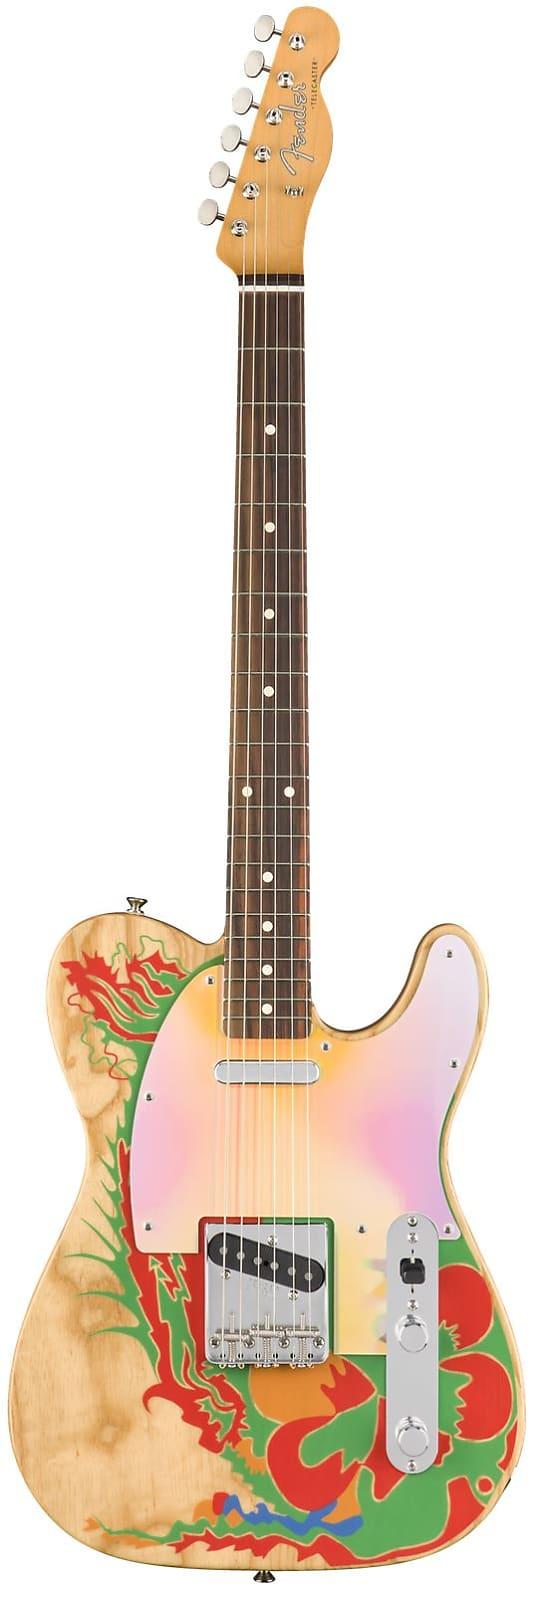 Fender 0146230721 Jimmy Page Telecaster®, Rosewood Fingerboard - Natural  2019